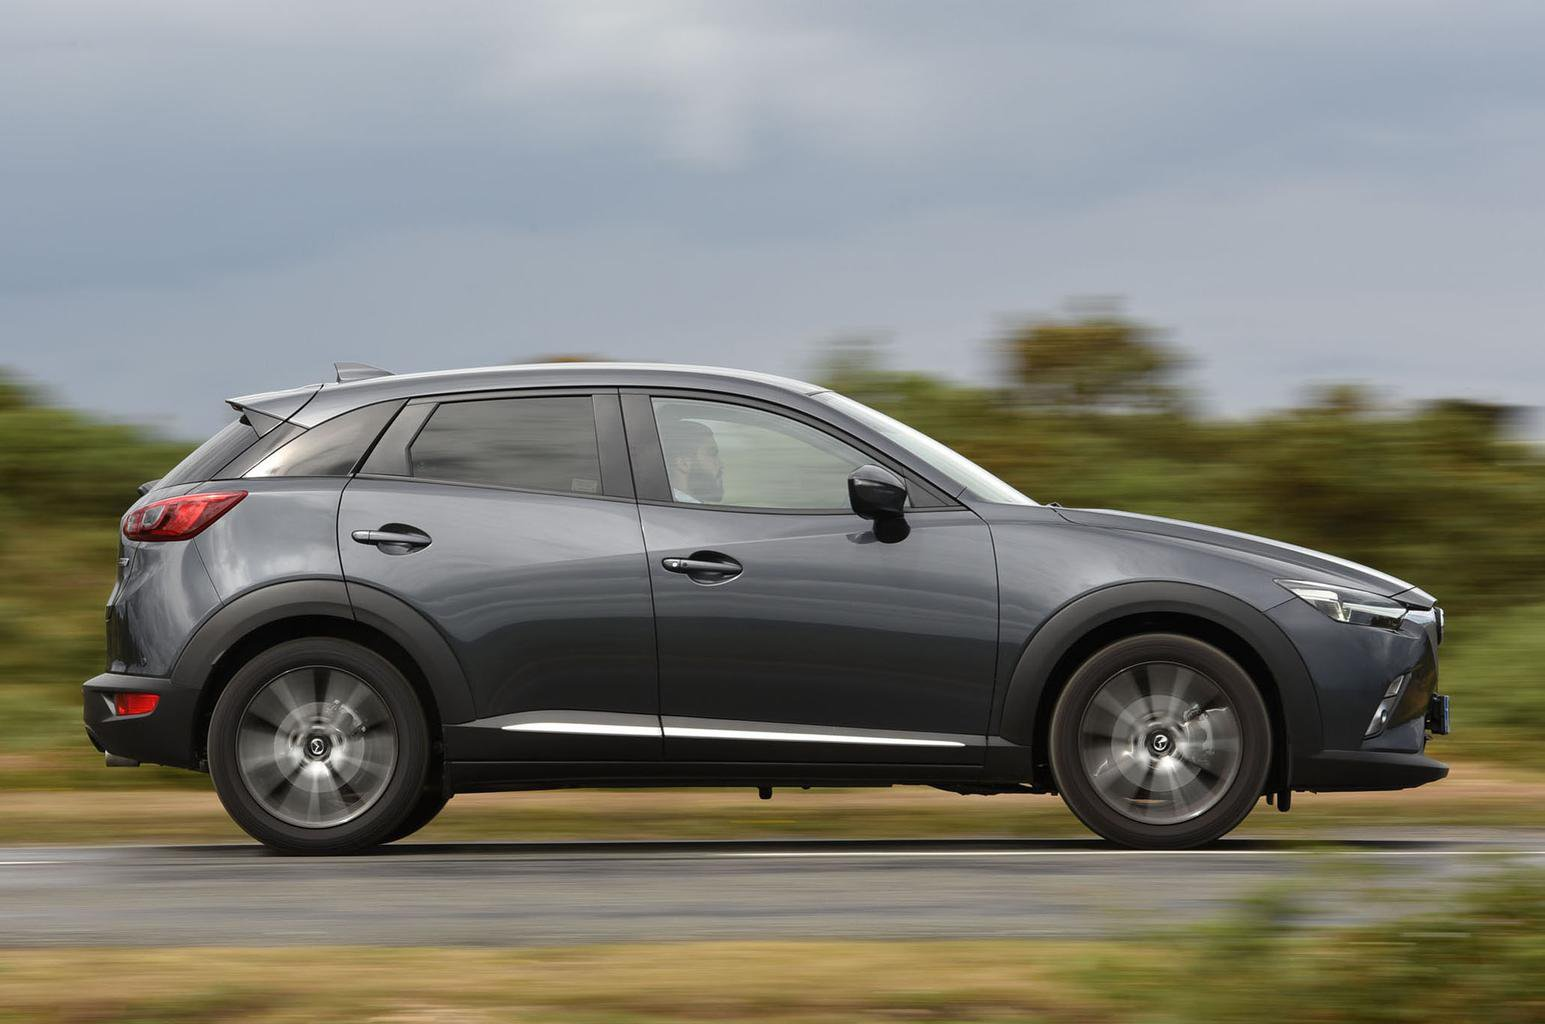 Honda HR-V vs Mazda CX-3 vs Nissan Qashqai